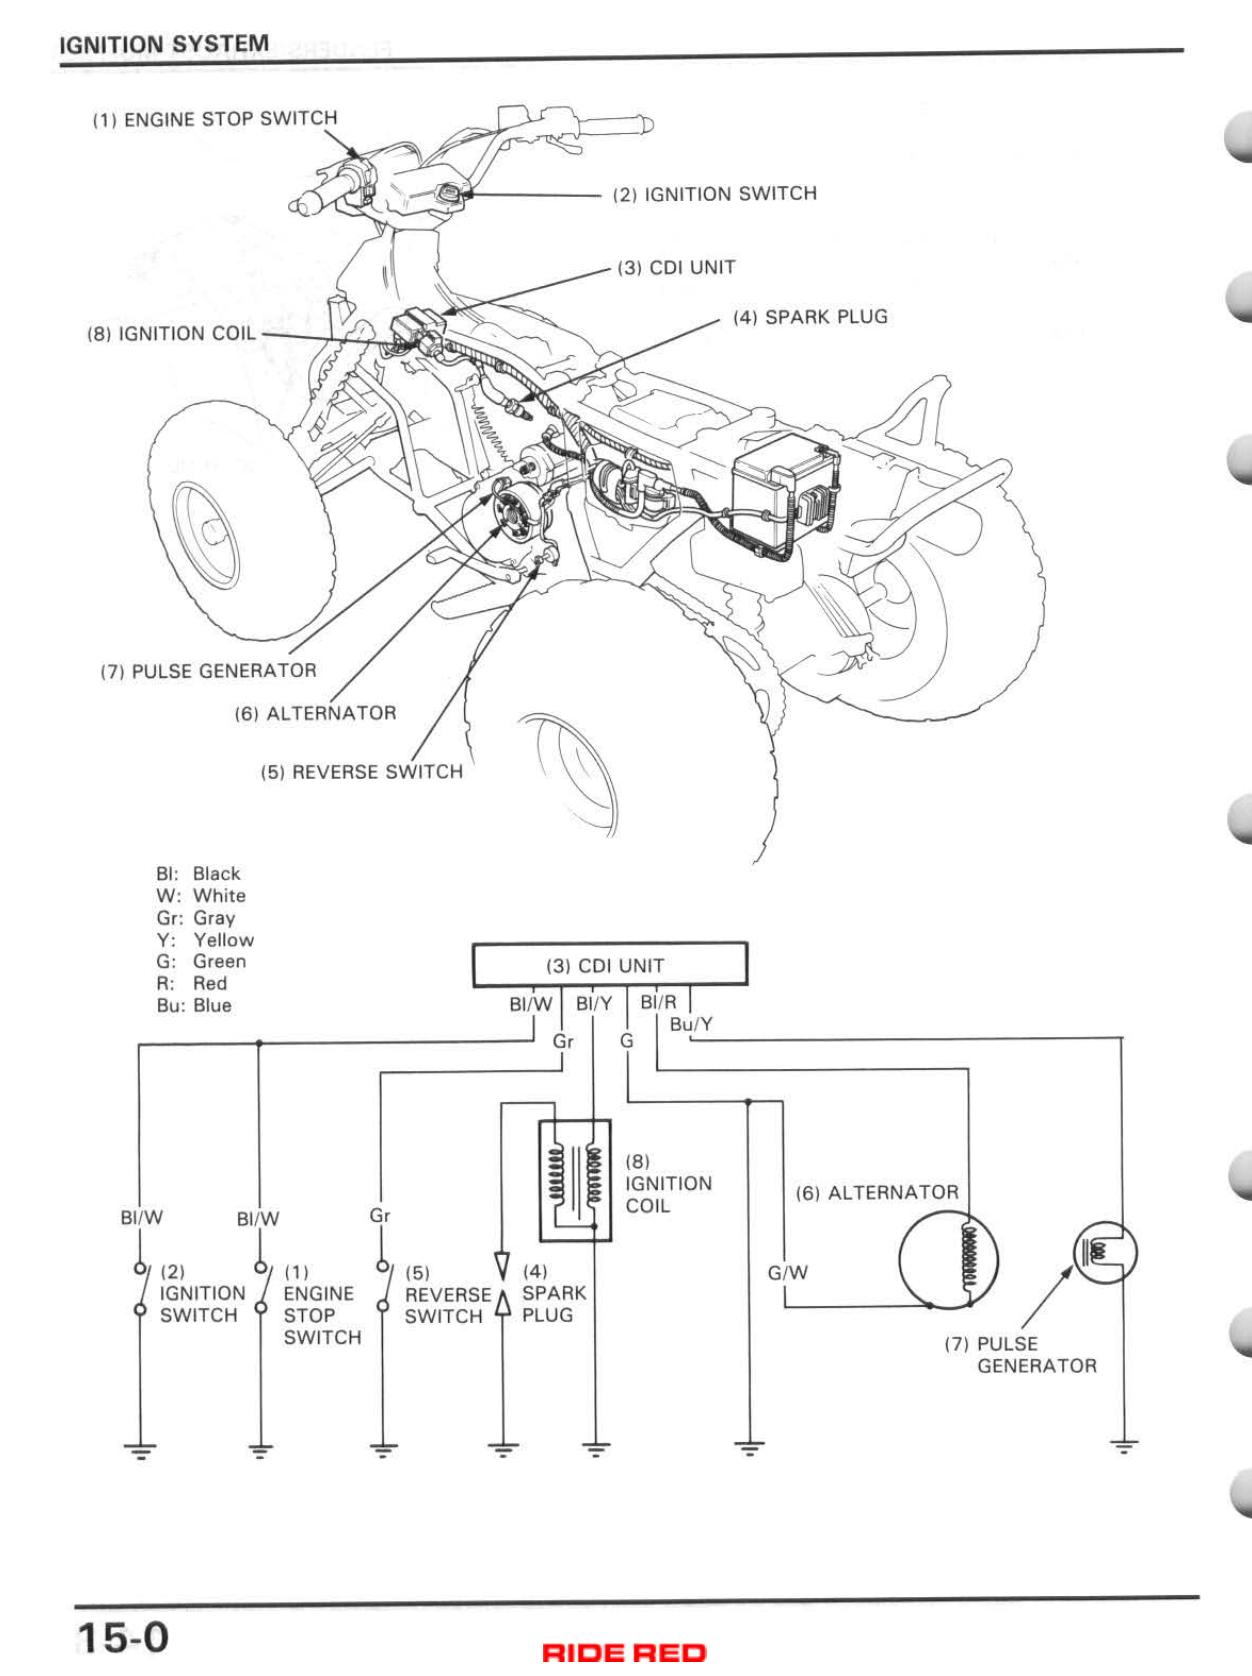 1987 Honda Atv 4 Wheeler Ignition Switch Wiring Diagram from www.hondaatvforums.net